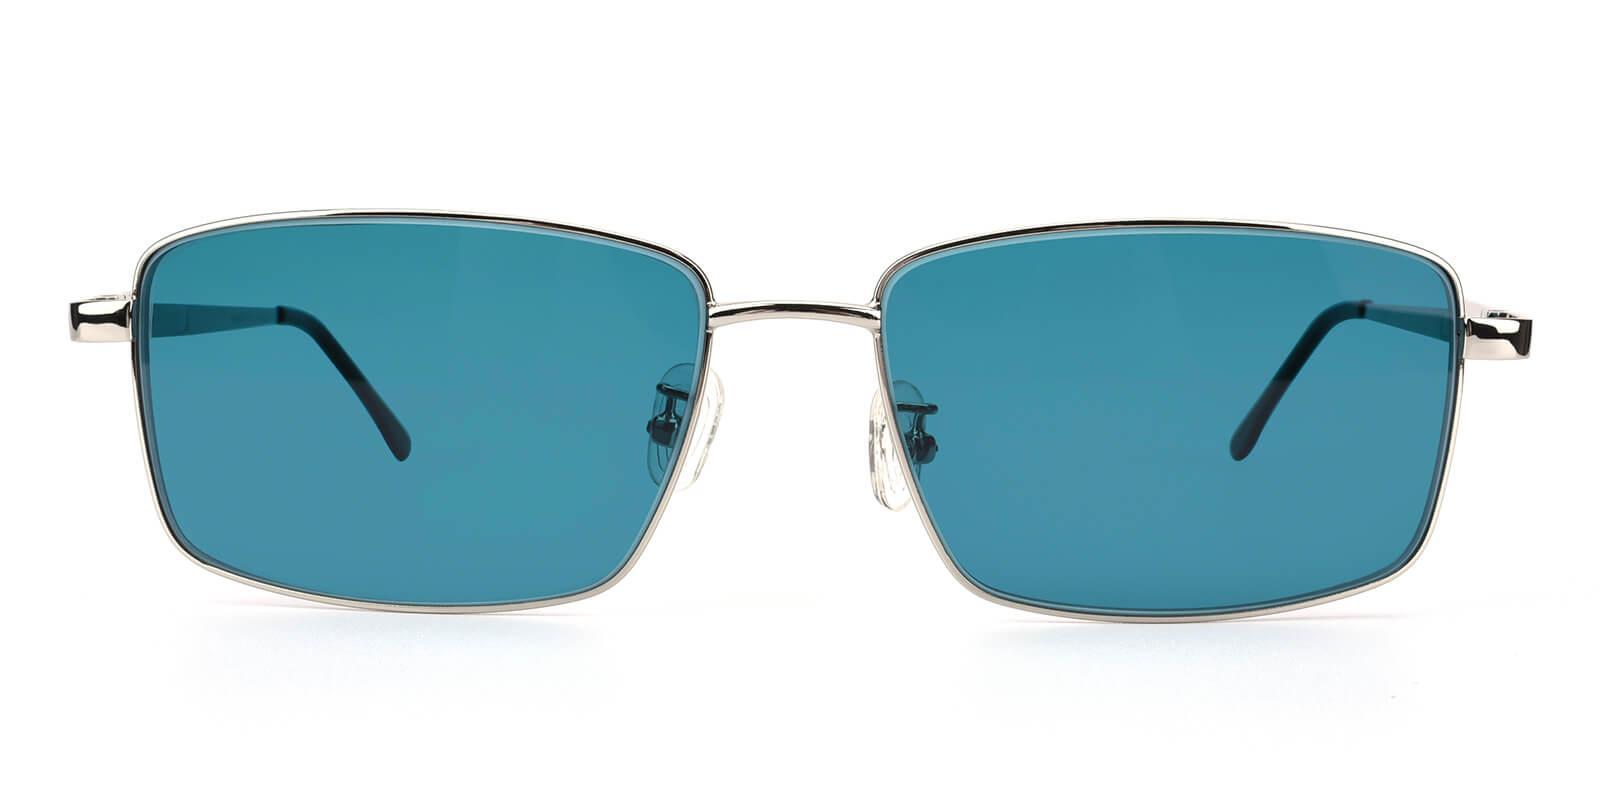 Sea-Silver-Rectangle-Metal-Sunglasses-additional2